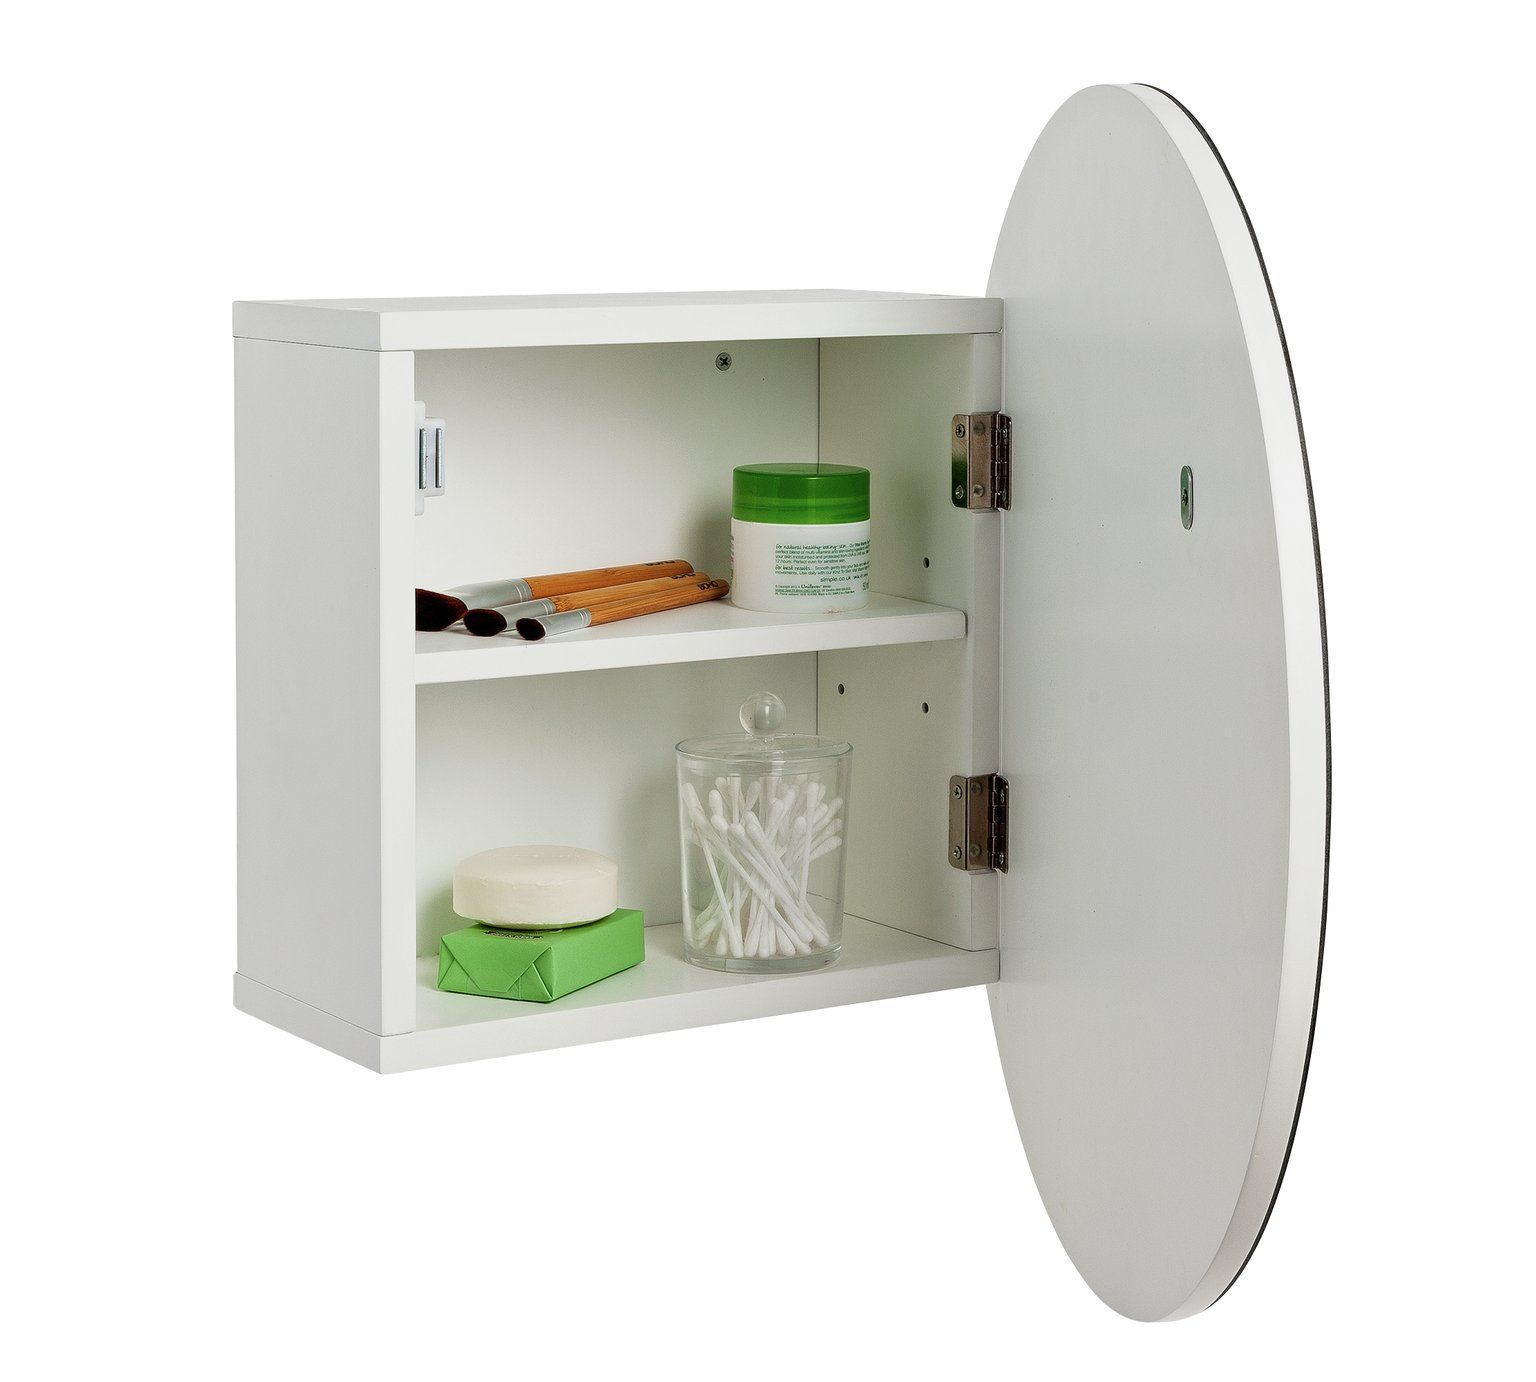 Buy Argos Home Circular Mirrored Bathroom Cabinet Bathroom Cabinets Argos Round Mirror Bathroom Argos Home Bathroom Mirror Cabinet